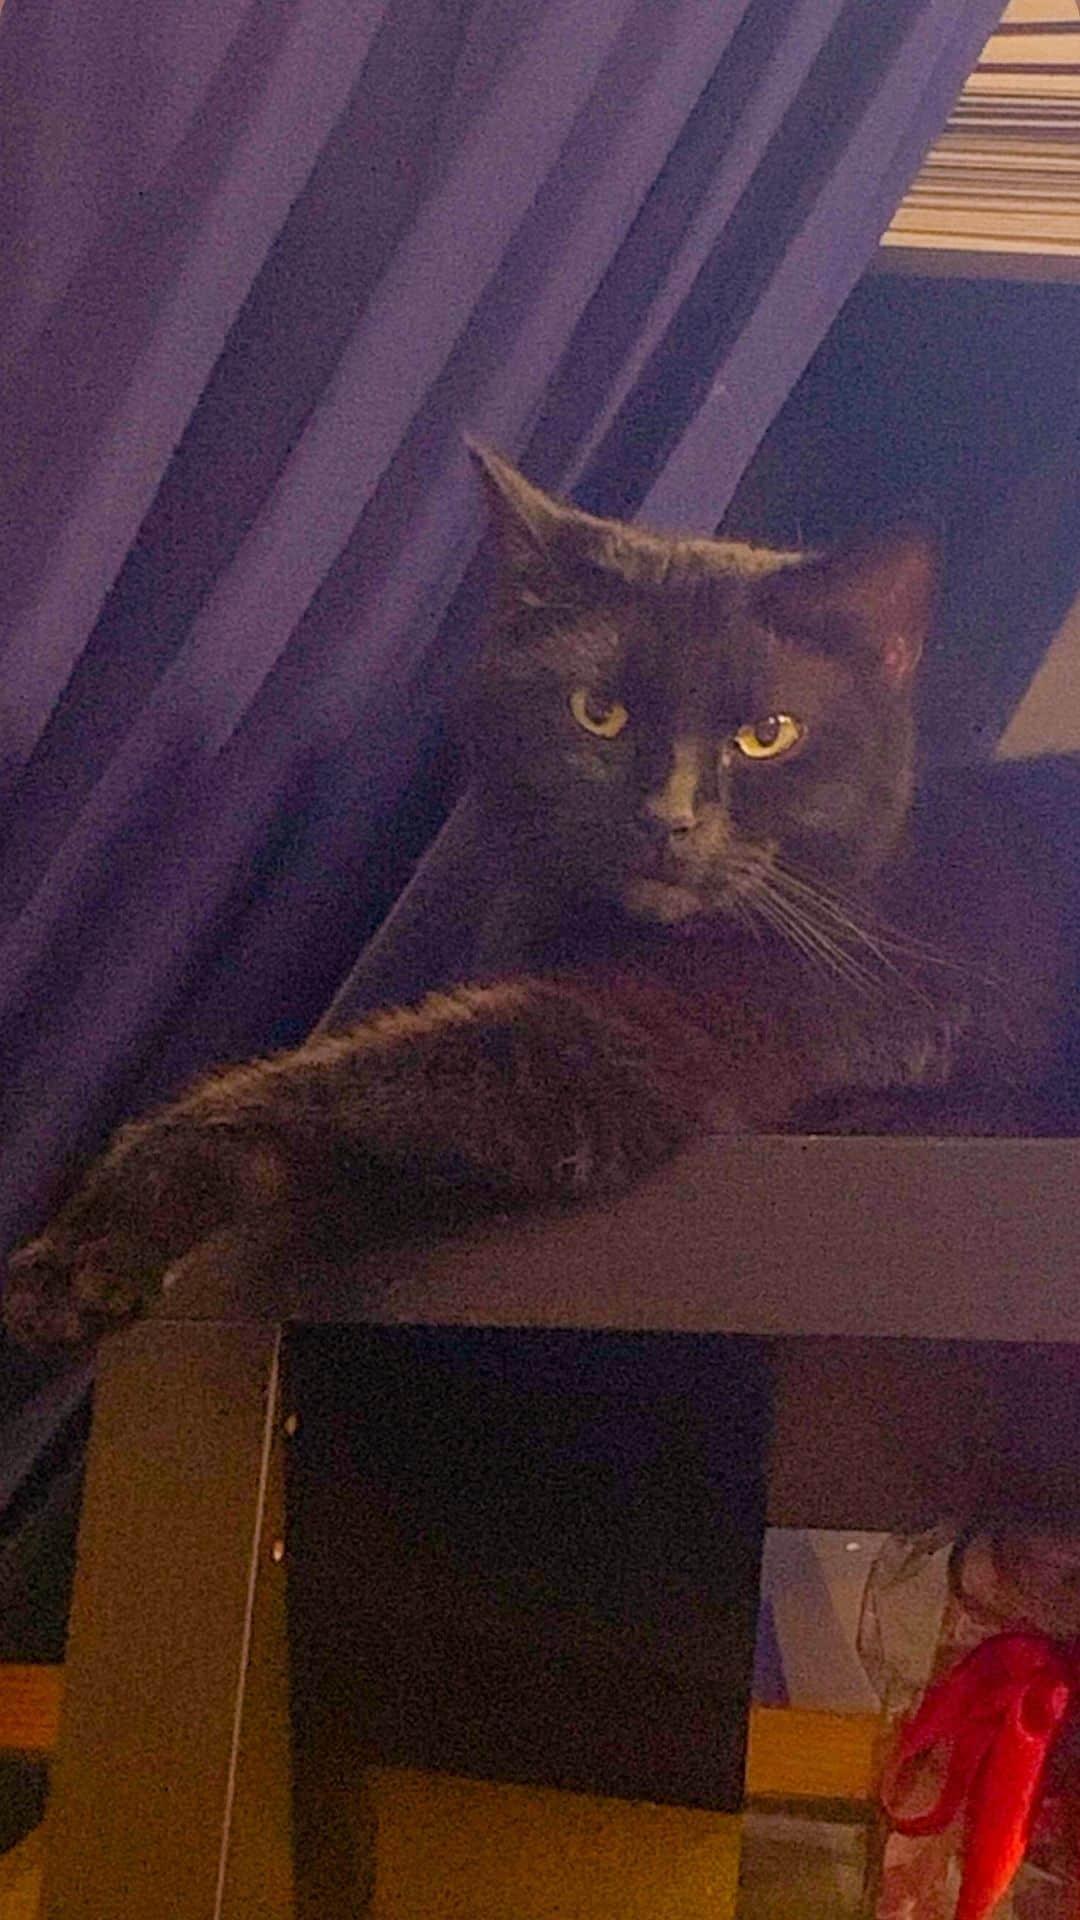 cat on bookshelf